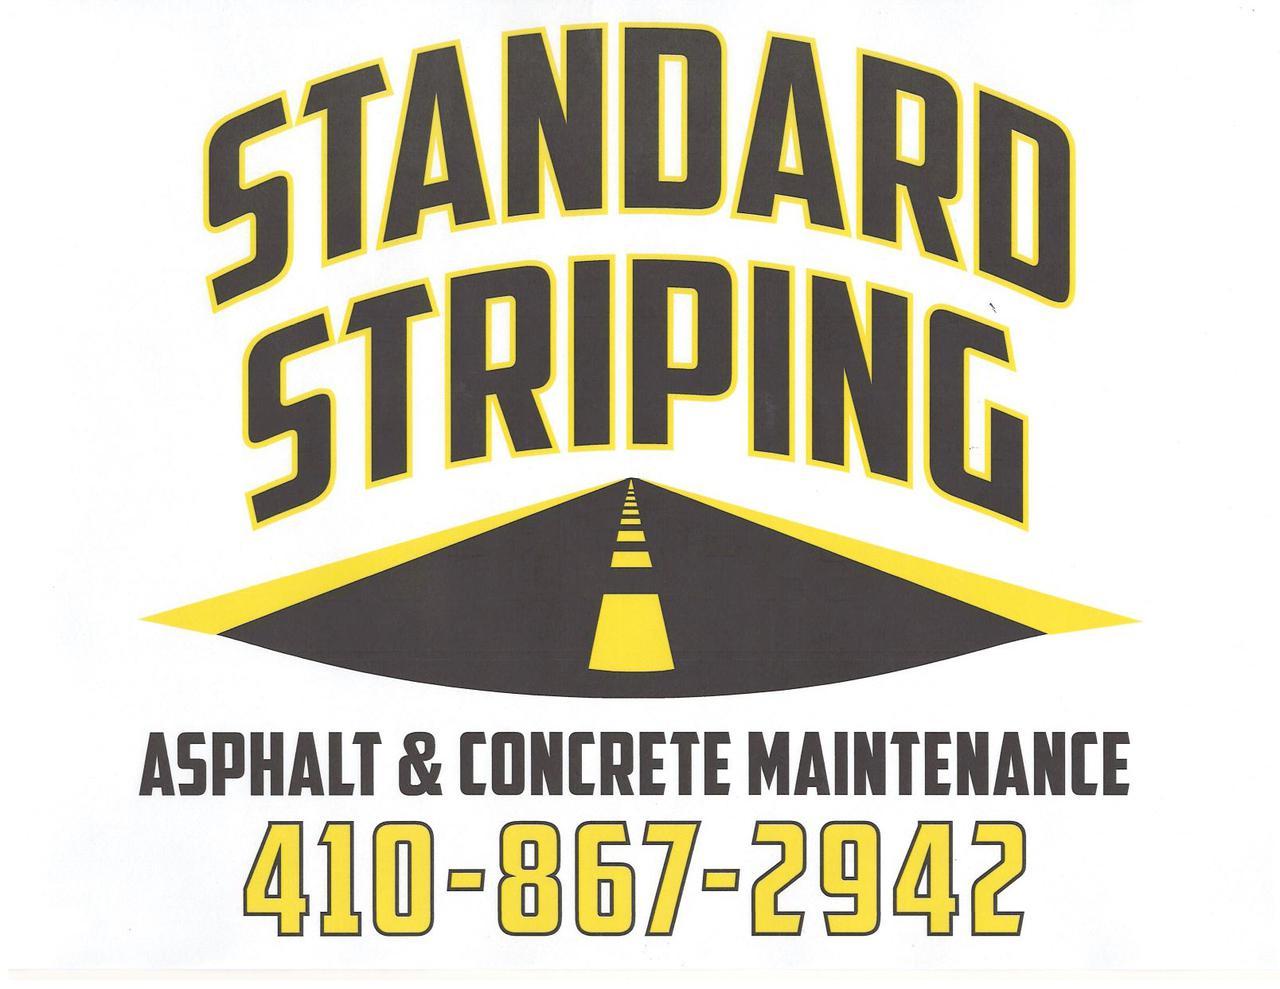 Standard Striping - concrete maintenance